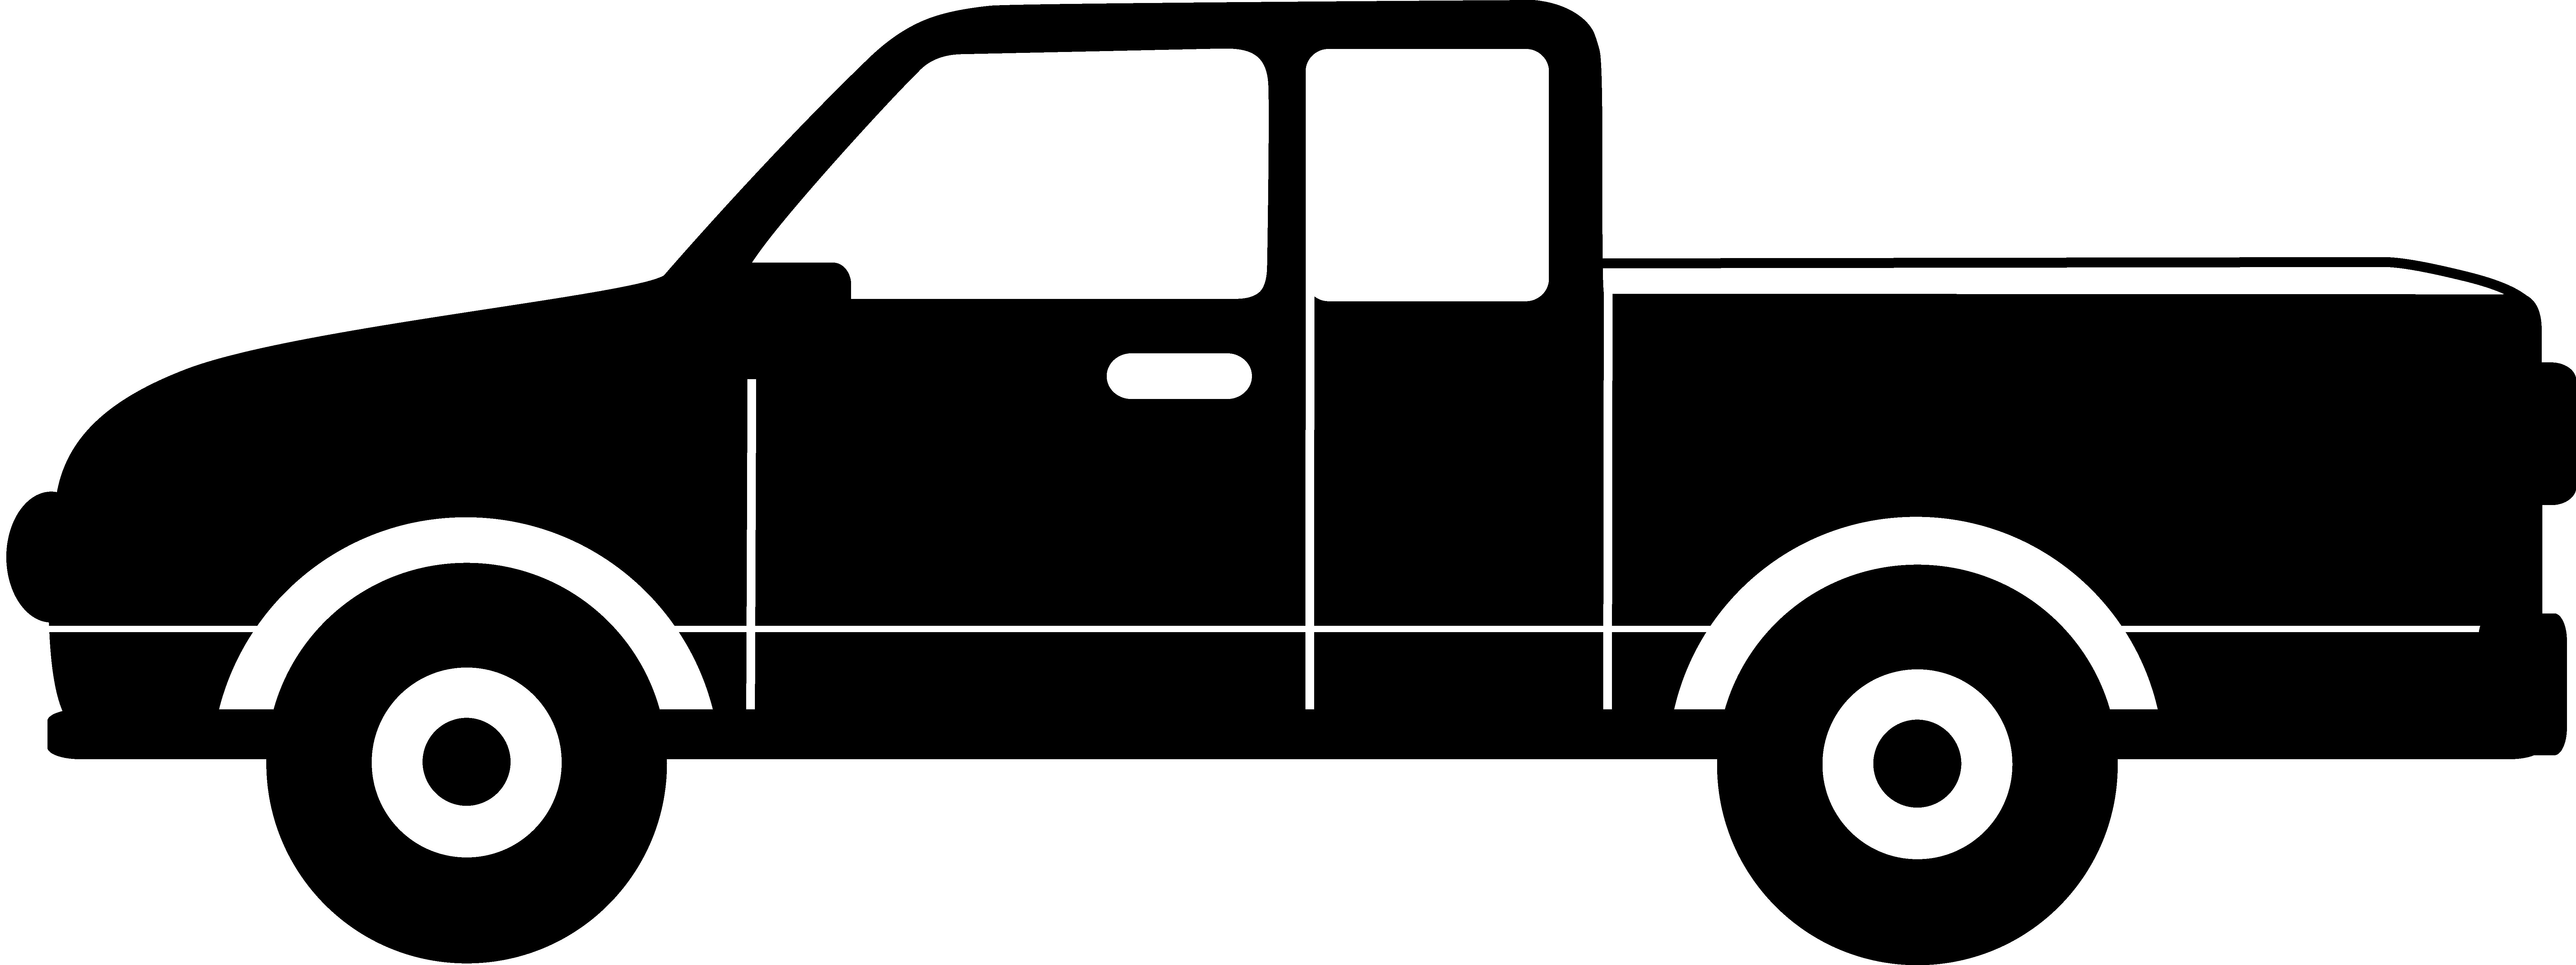 Silhouette Truck